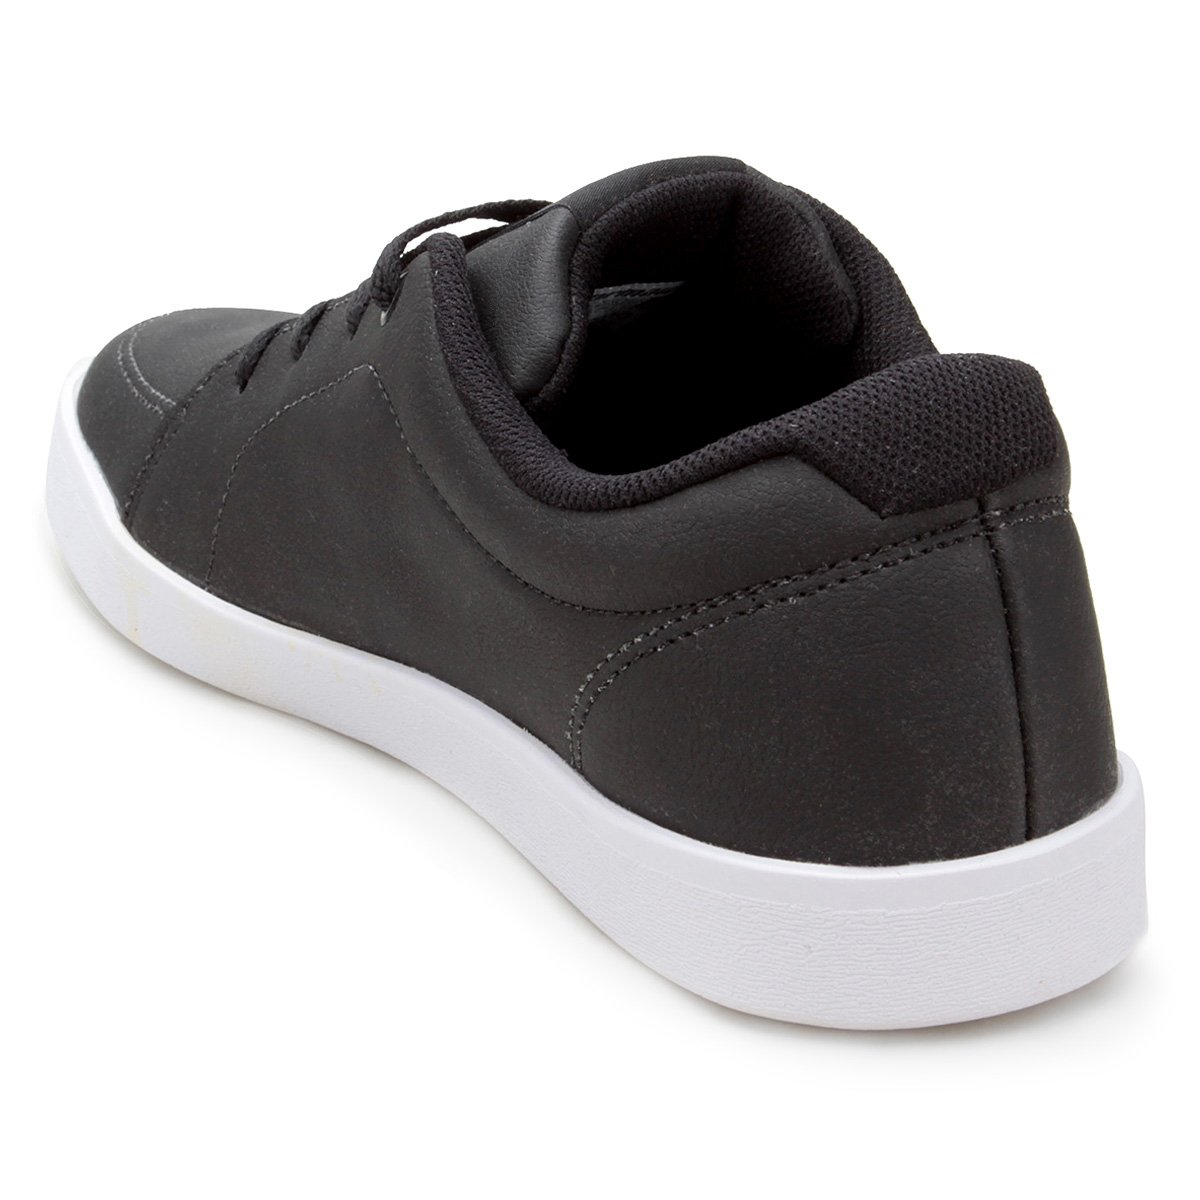 29d60729787e1 Tênis Mormaii Kick Masculino - Compre Agora   Zattini